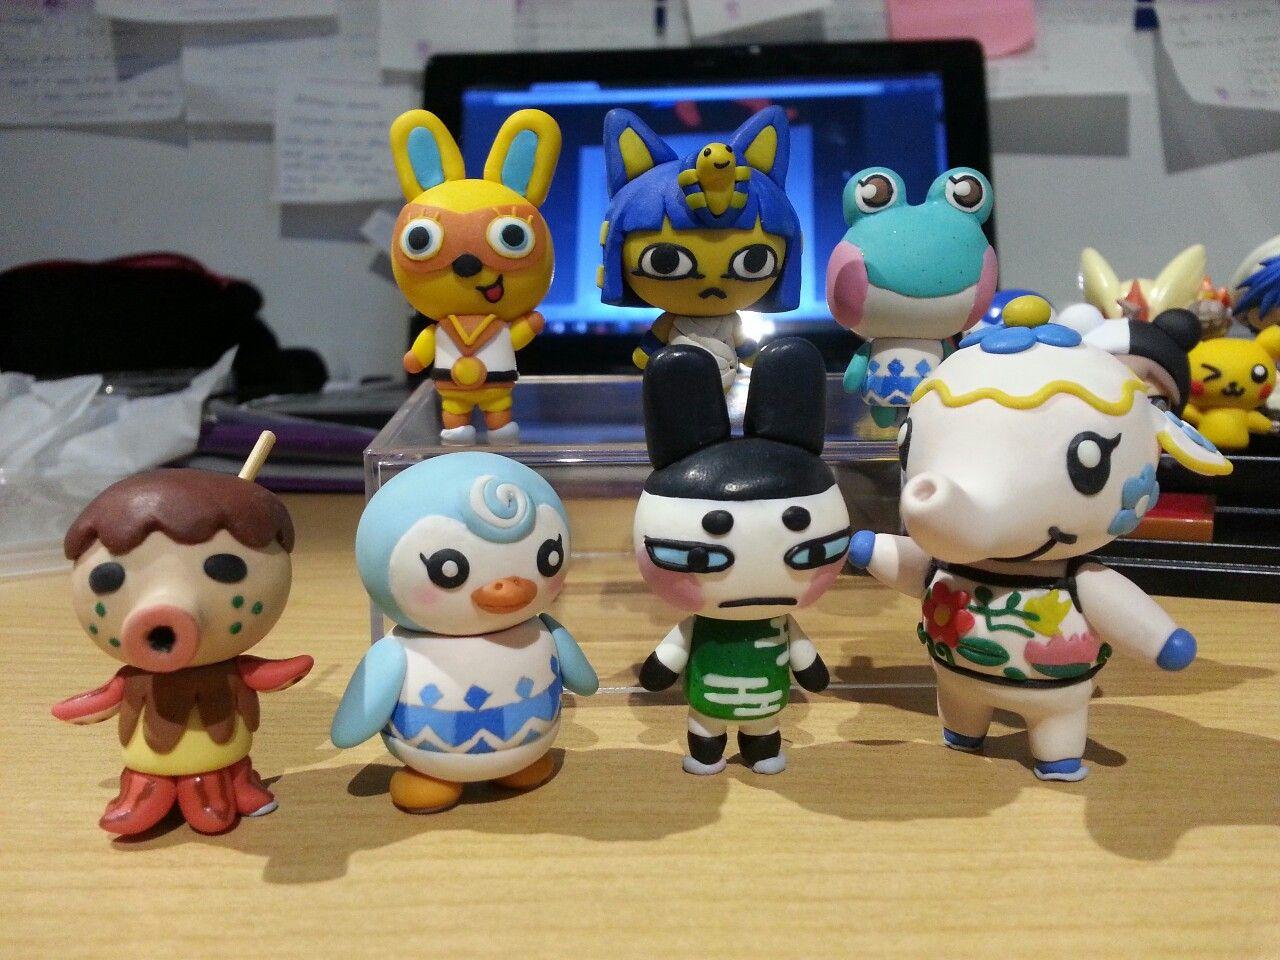 Town Of Sindria Photo Animal Crossing Plush Animal Crossing Printable Animals